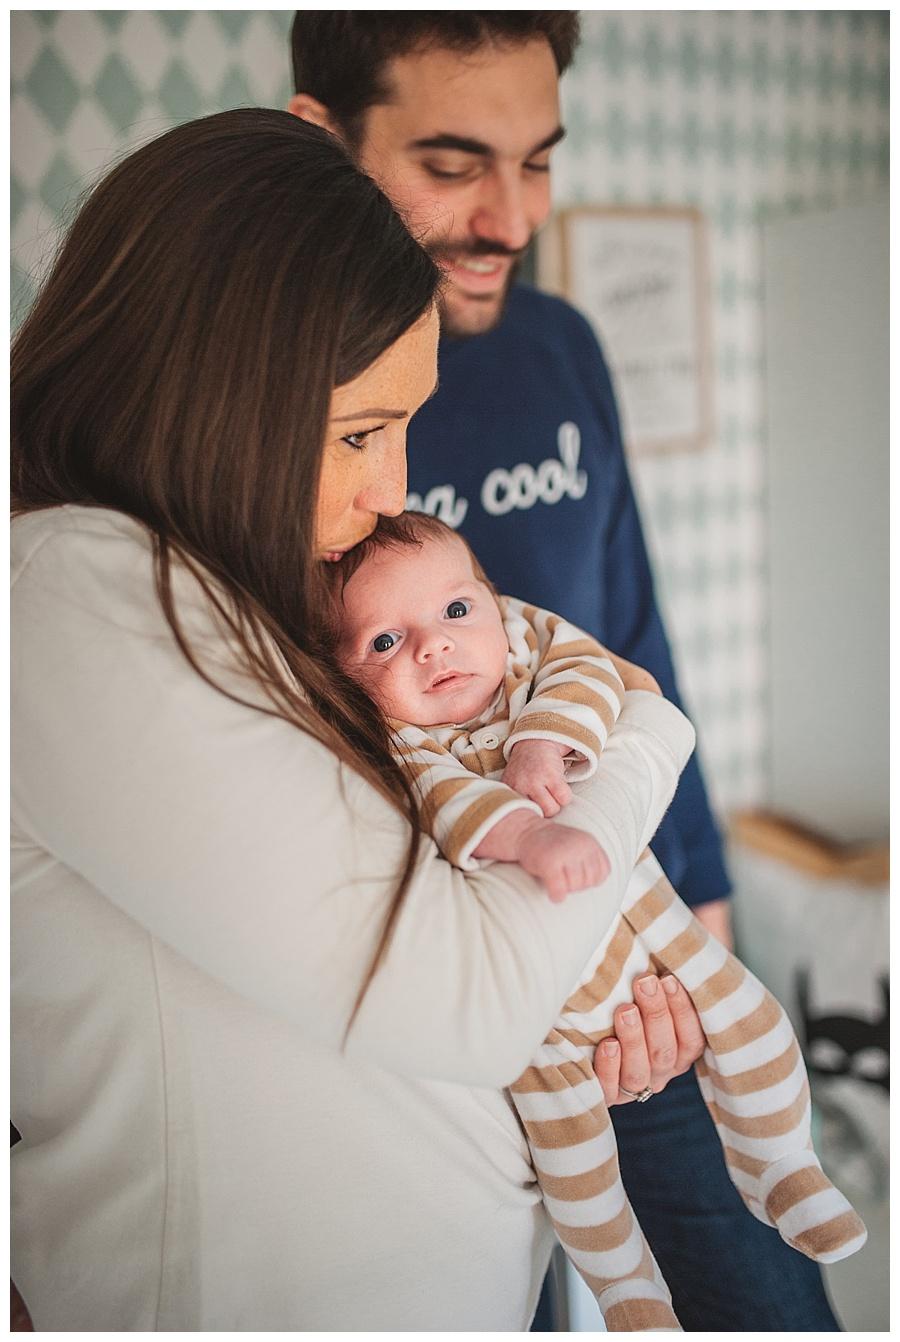 sweetmomes photographe naissance lyon chambery